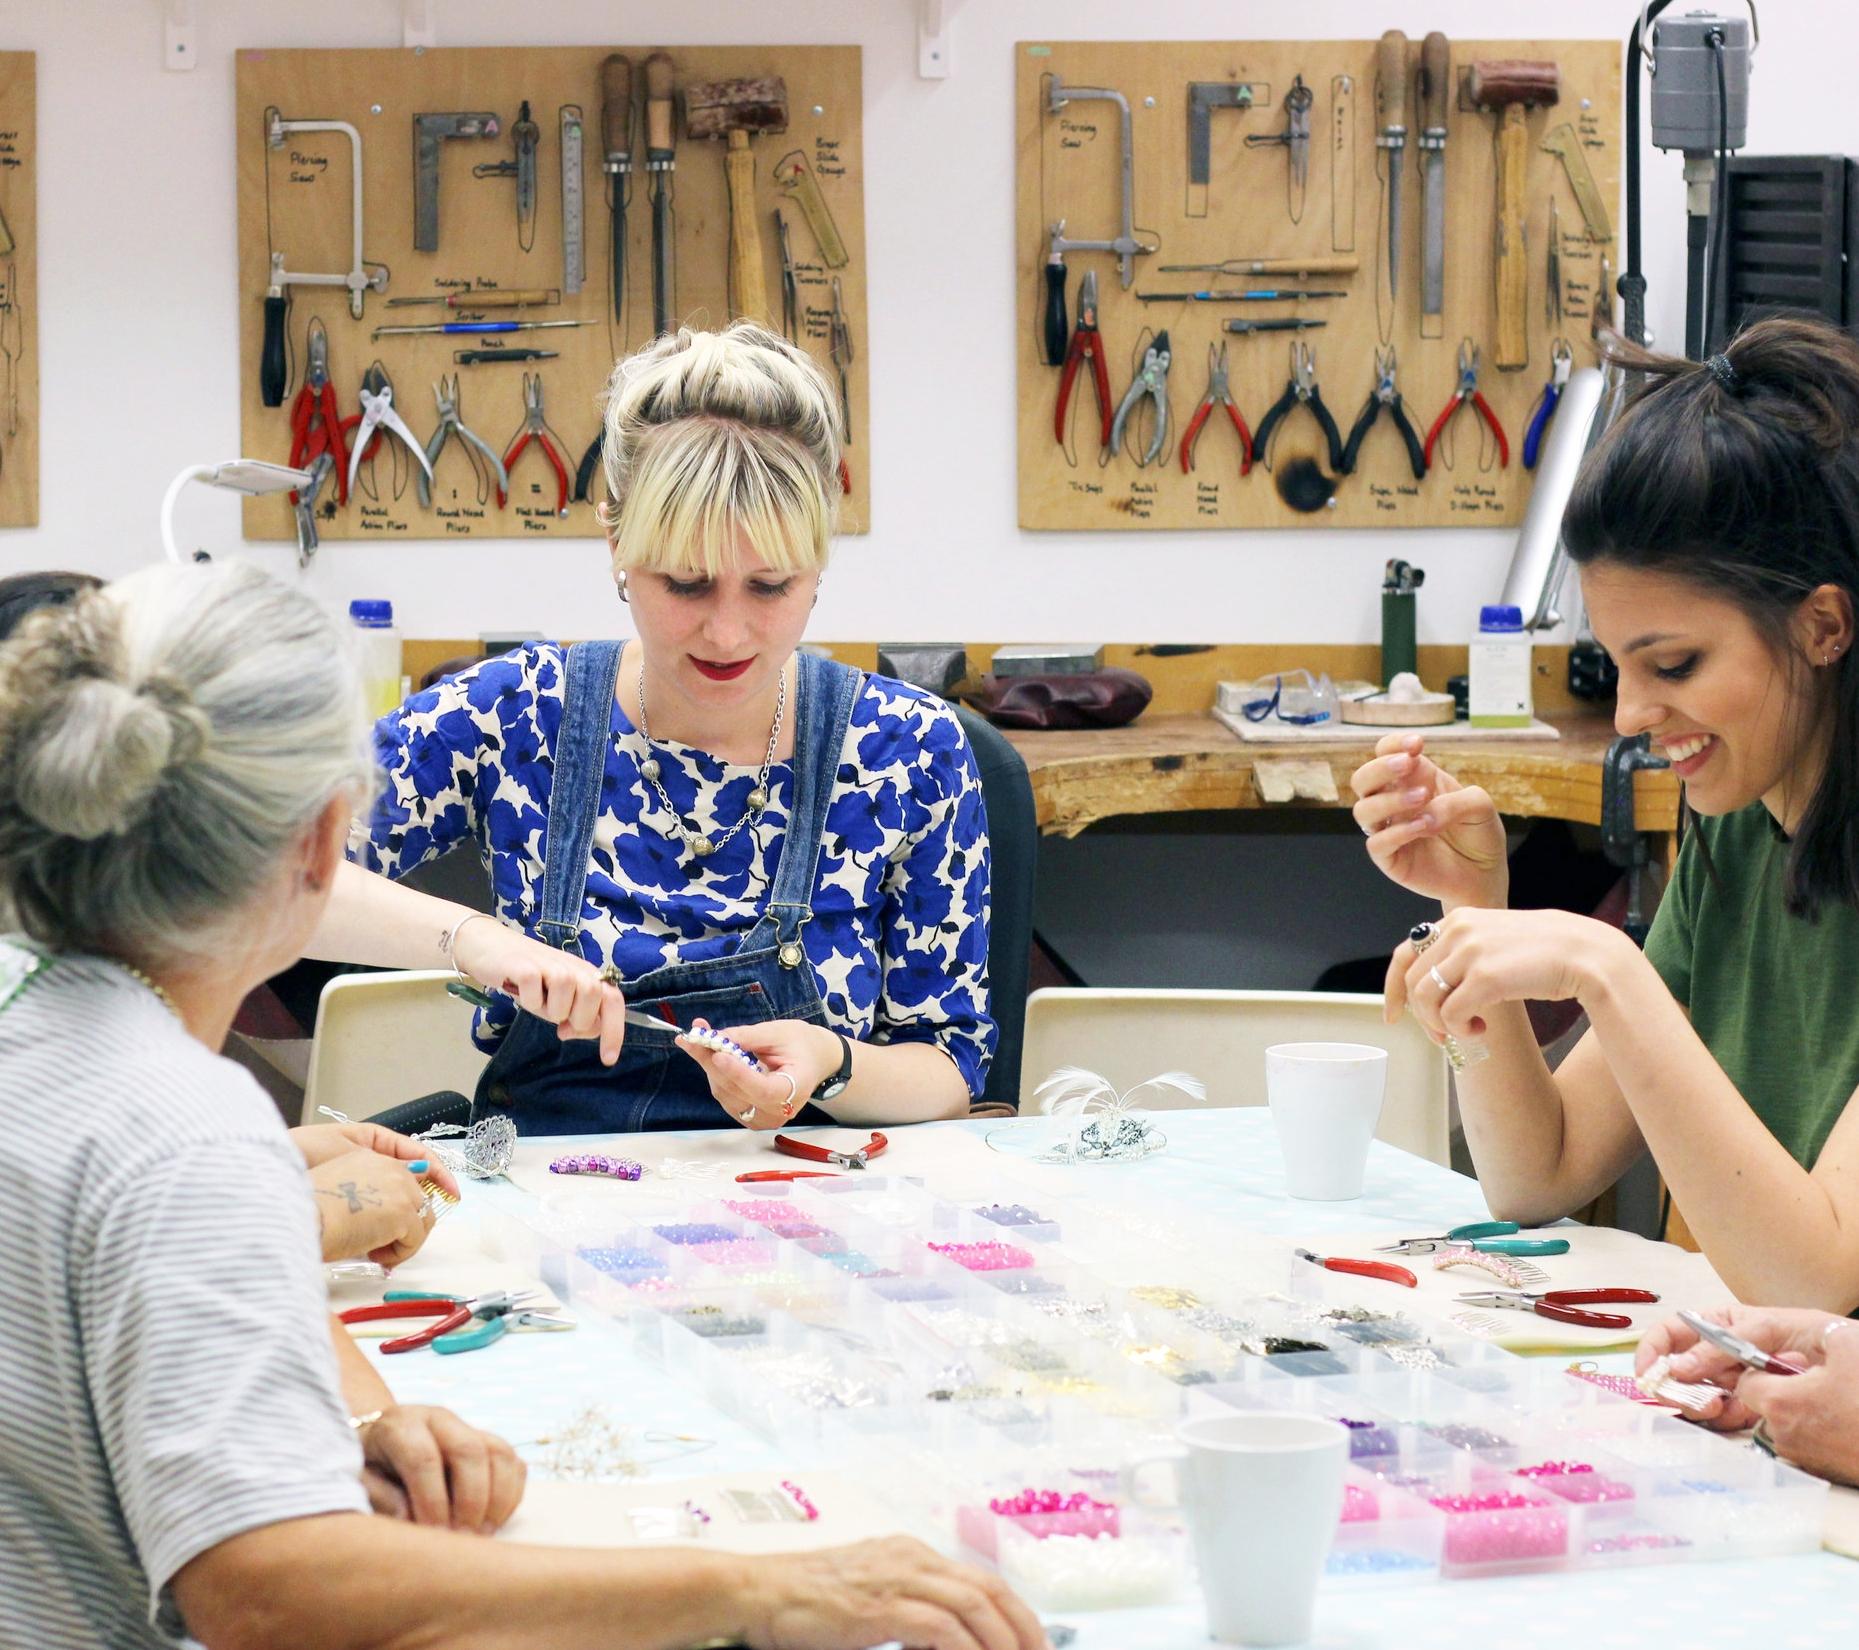 London_Jewellery_School_Diploma_in_Creative_Jewellery_Students_hard_at_work_03.jpg